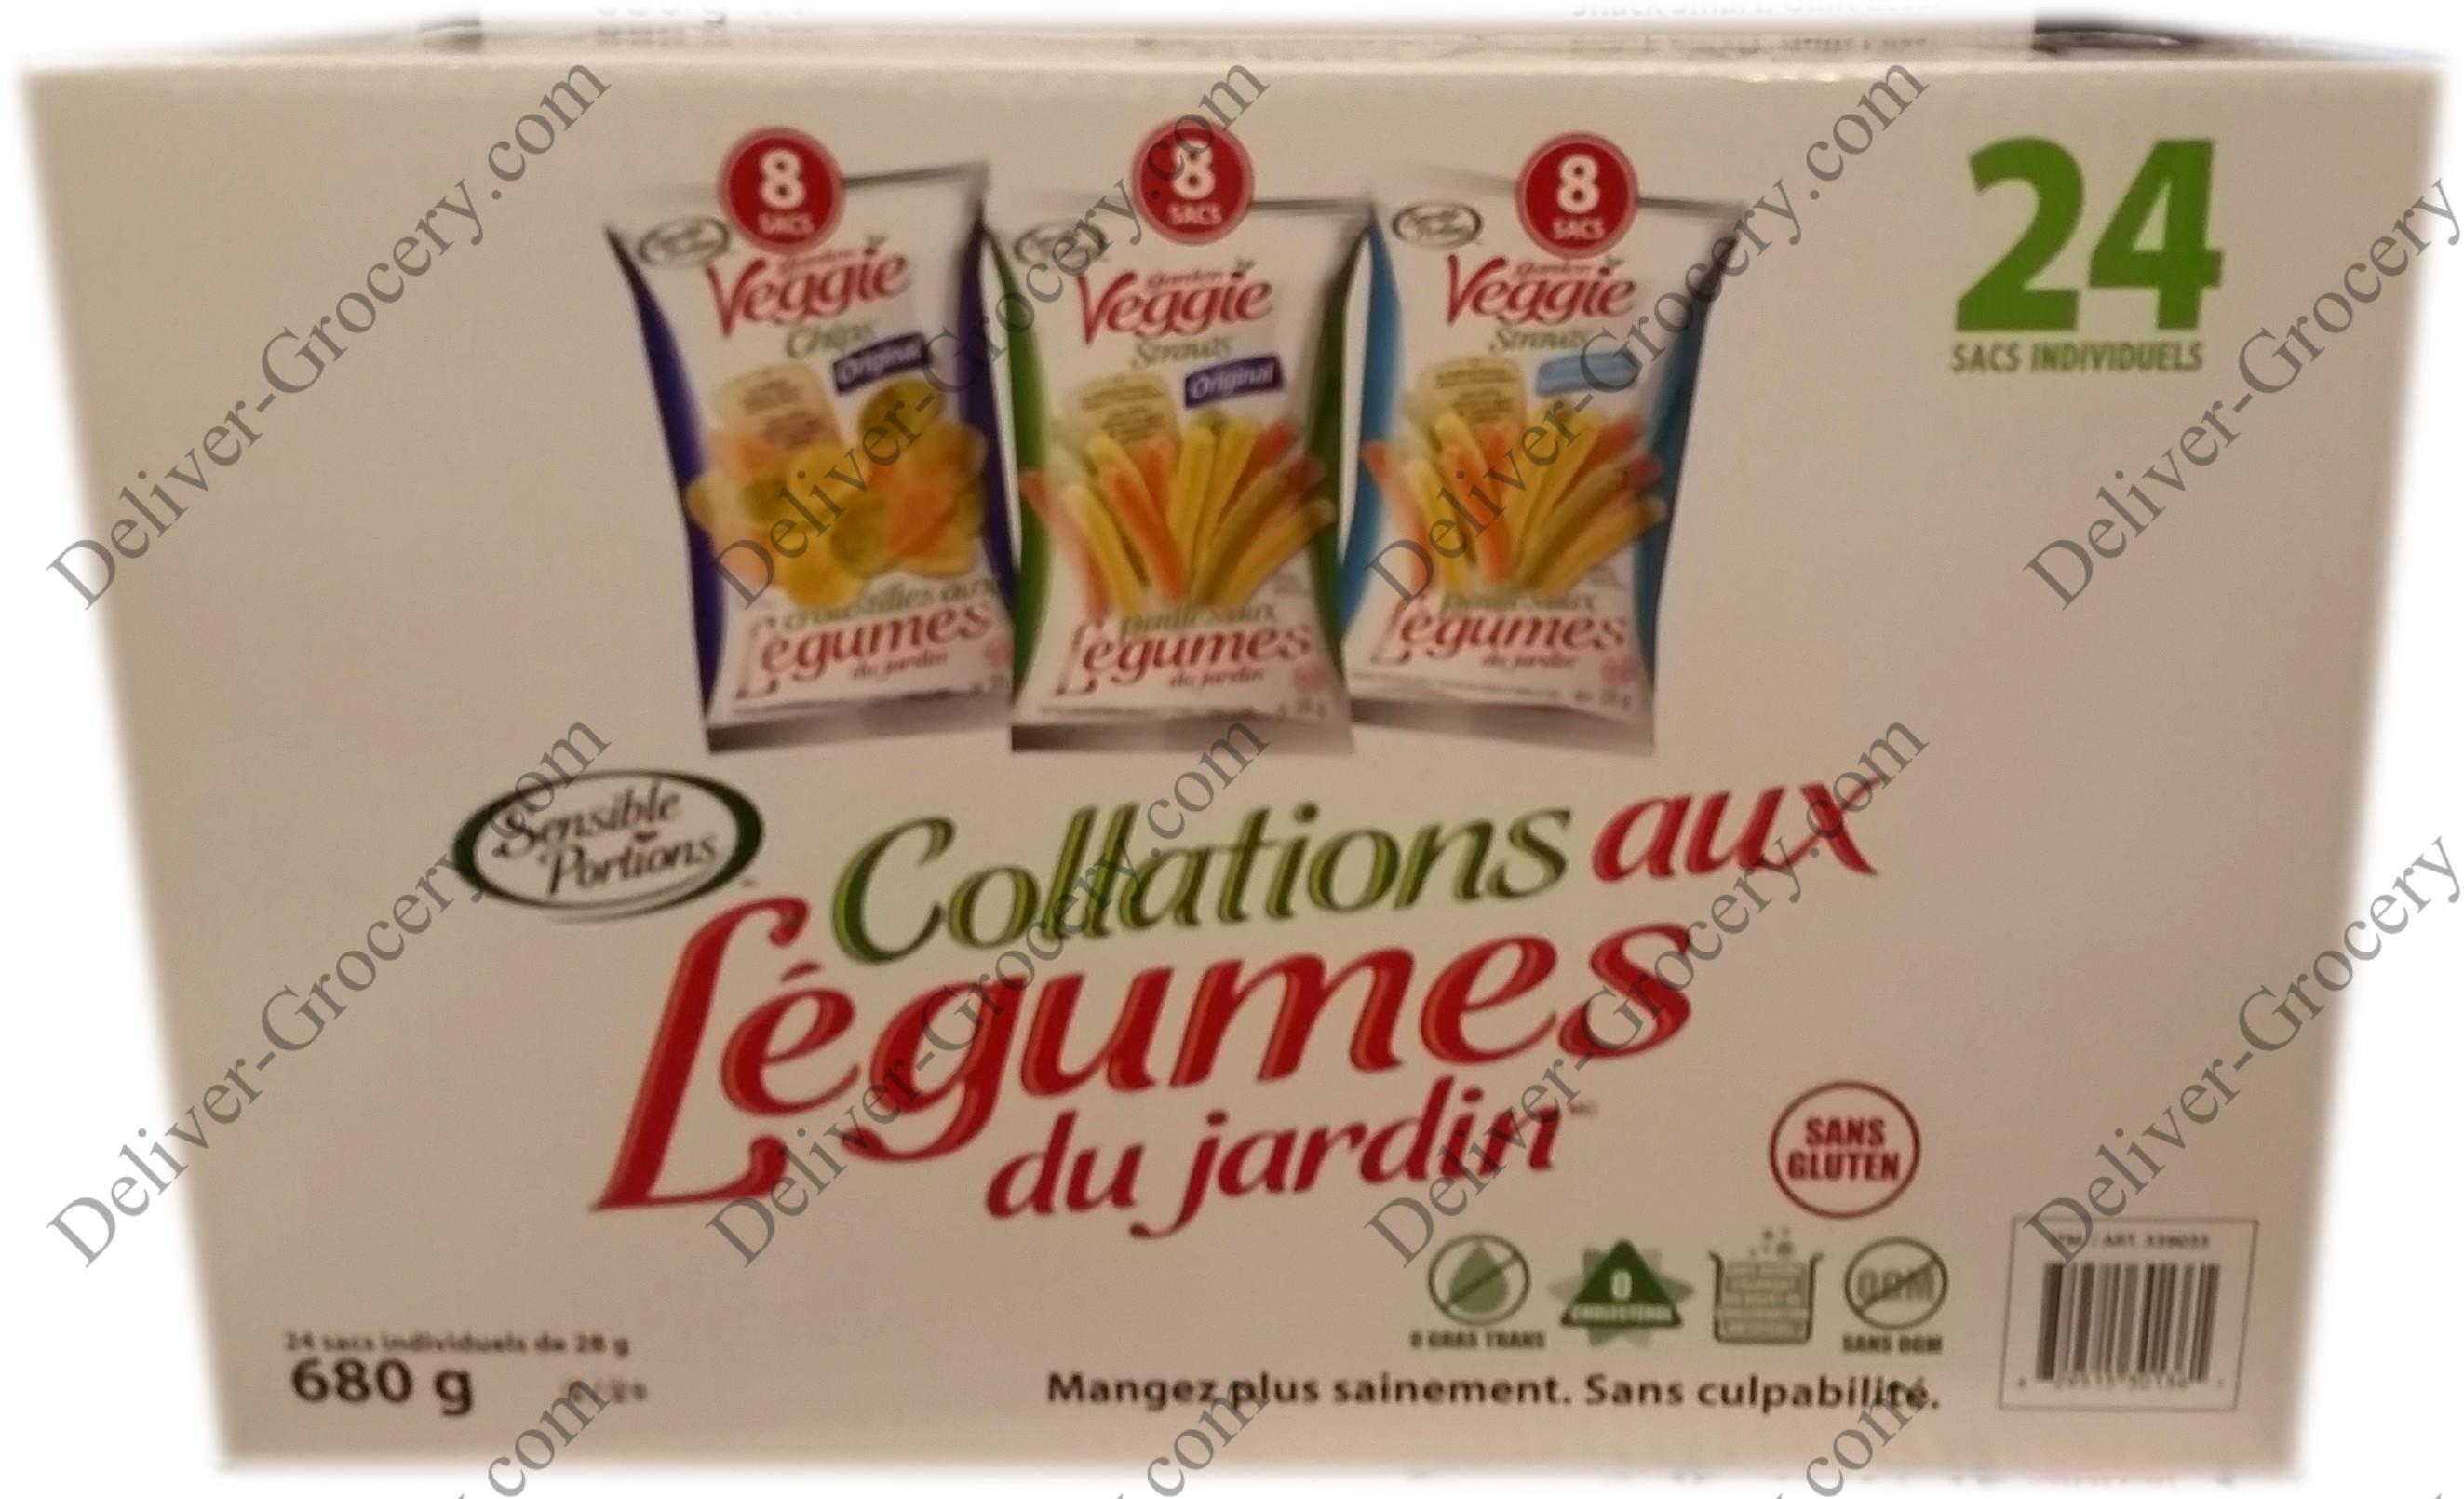 Sensible Portions Garden Veggie Snacks, 24 x 28 g - Deliver-Grocery ...